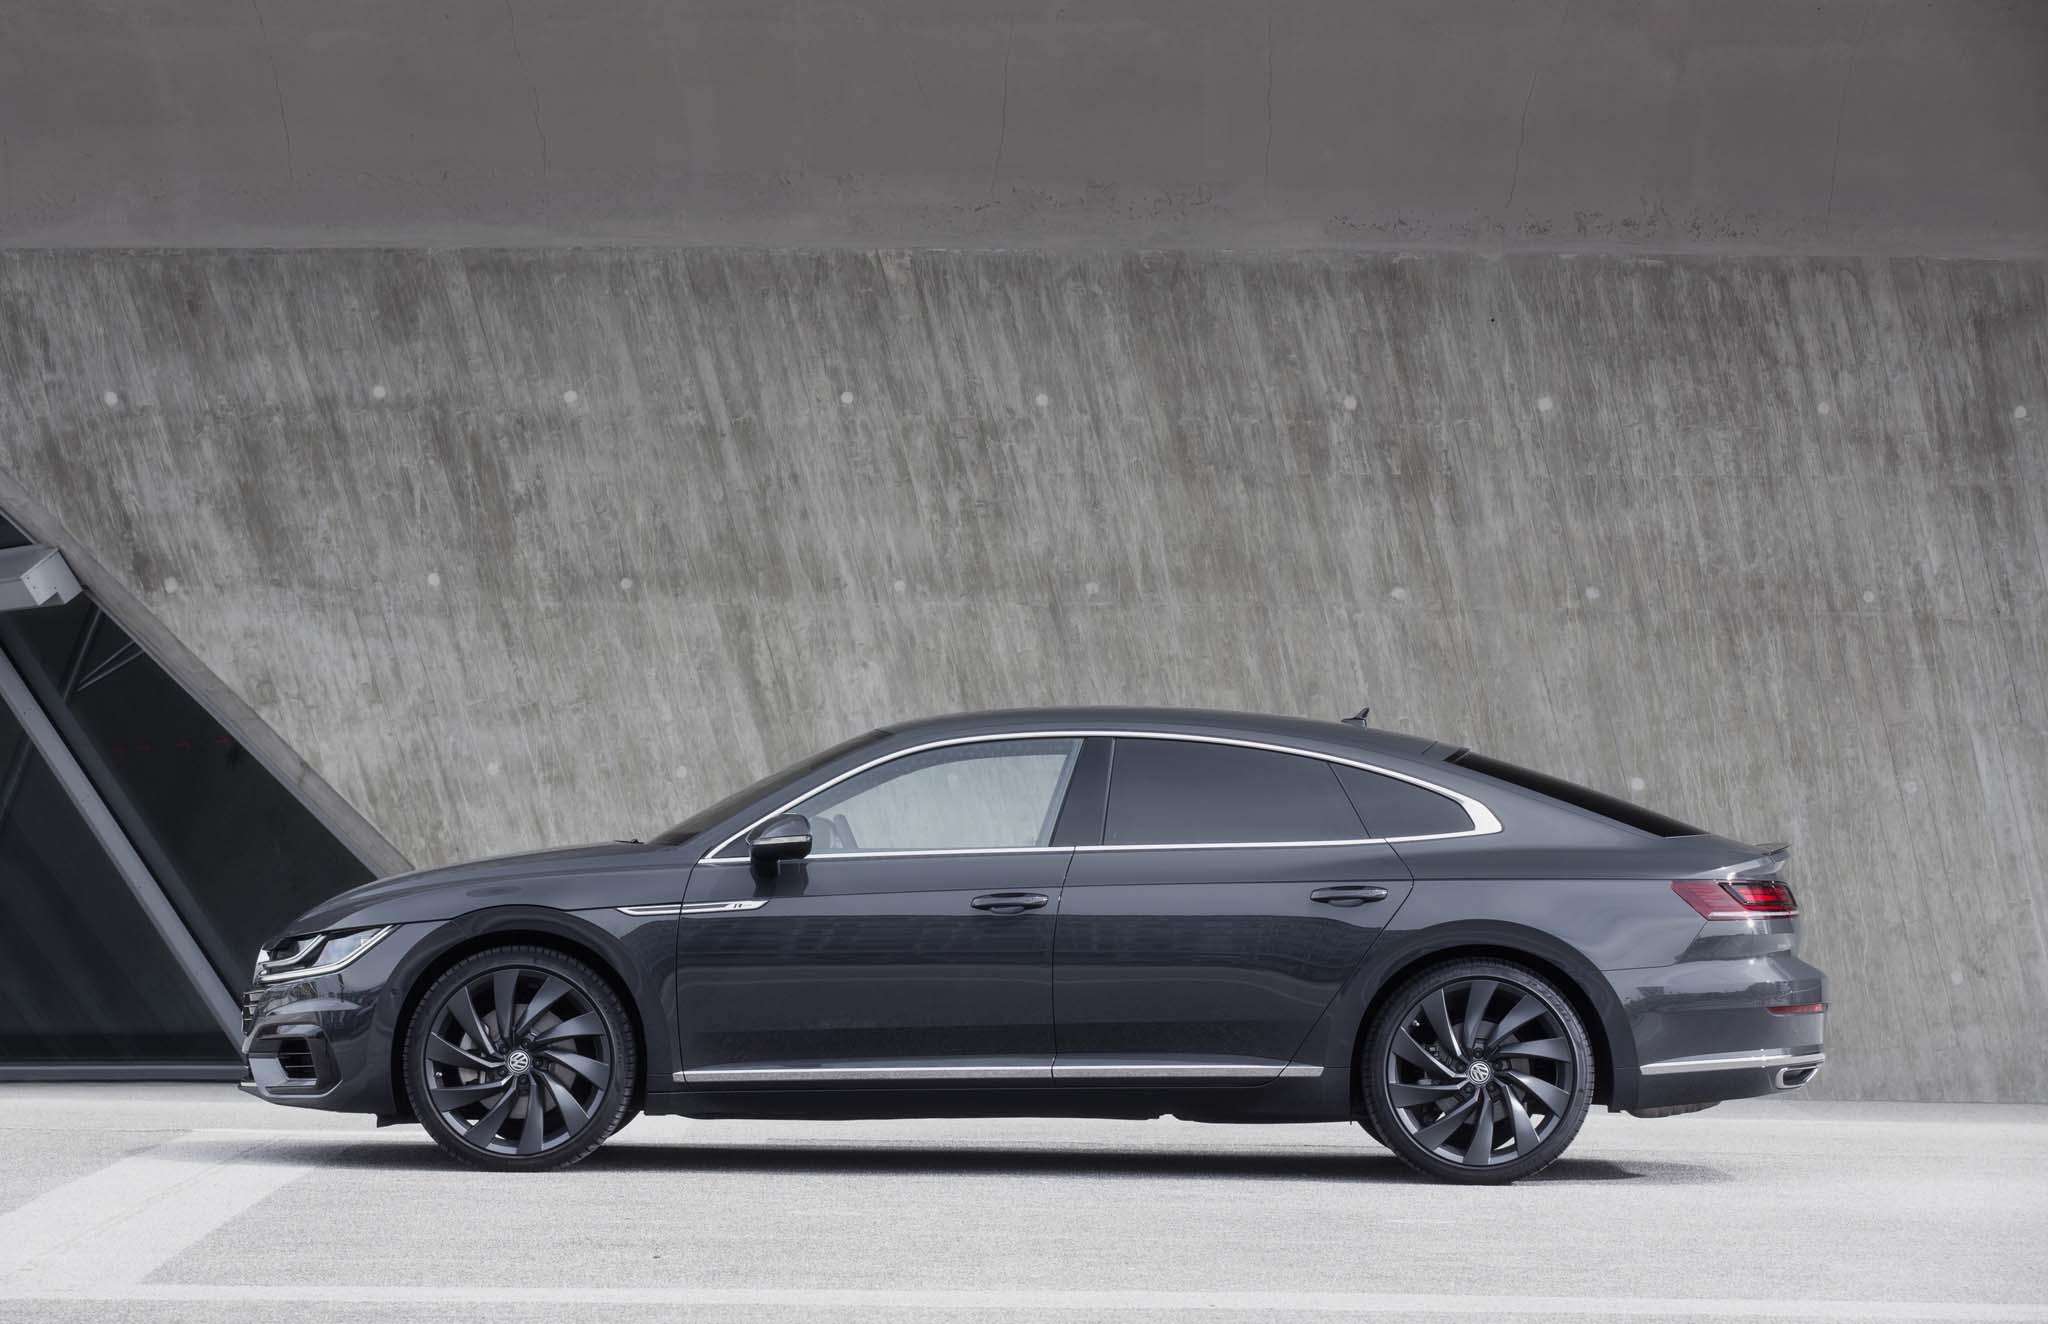 2019 volkswagen arteon first drive review automobile. Black Bedroom Furniture Sets. Home Design Ideas